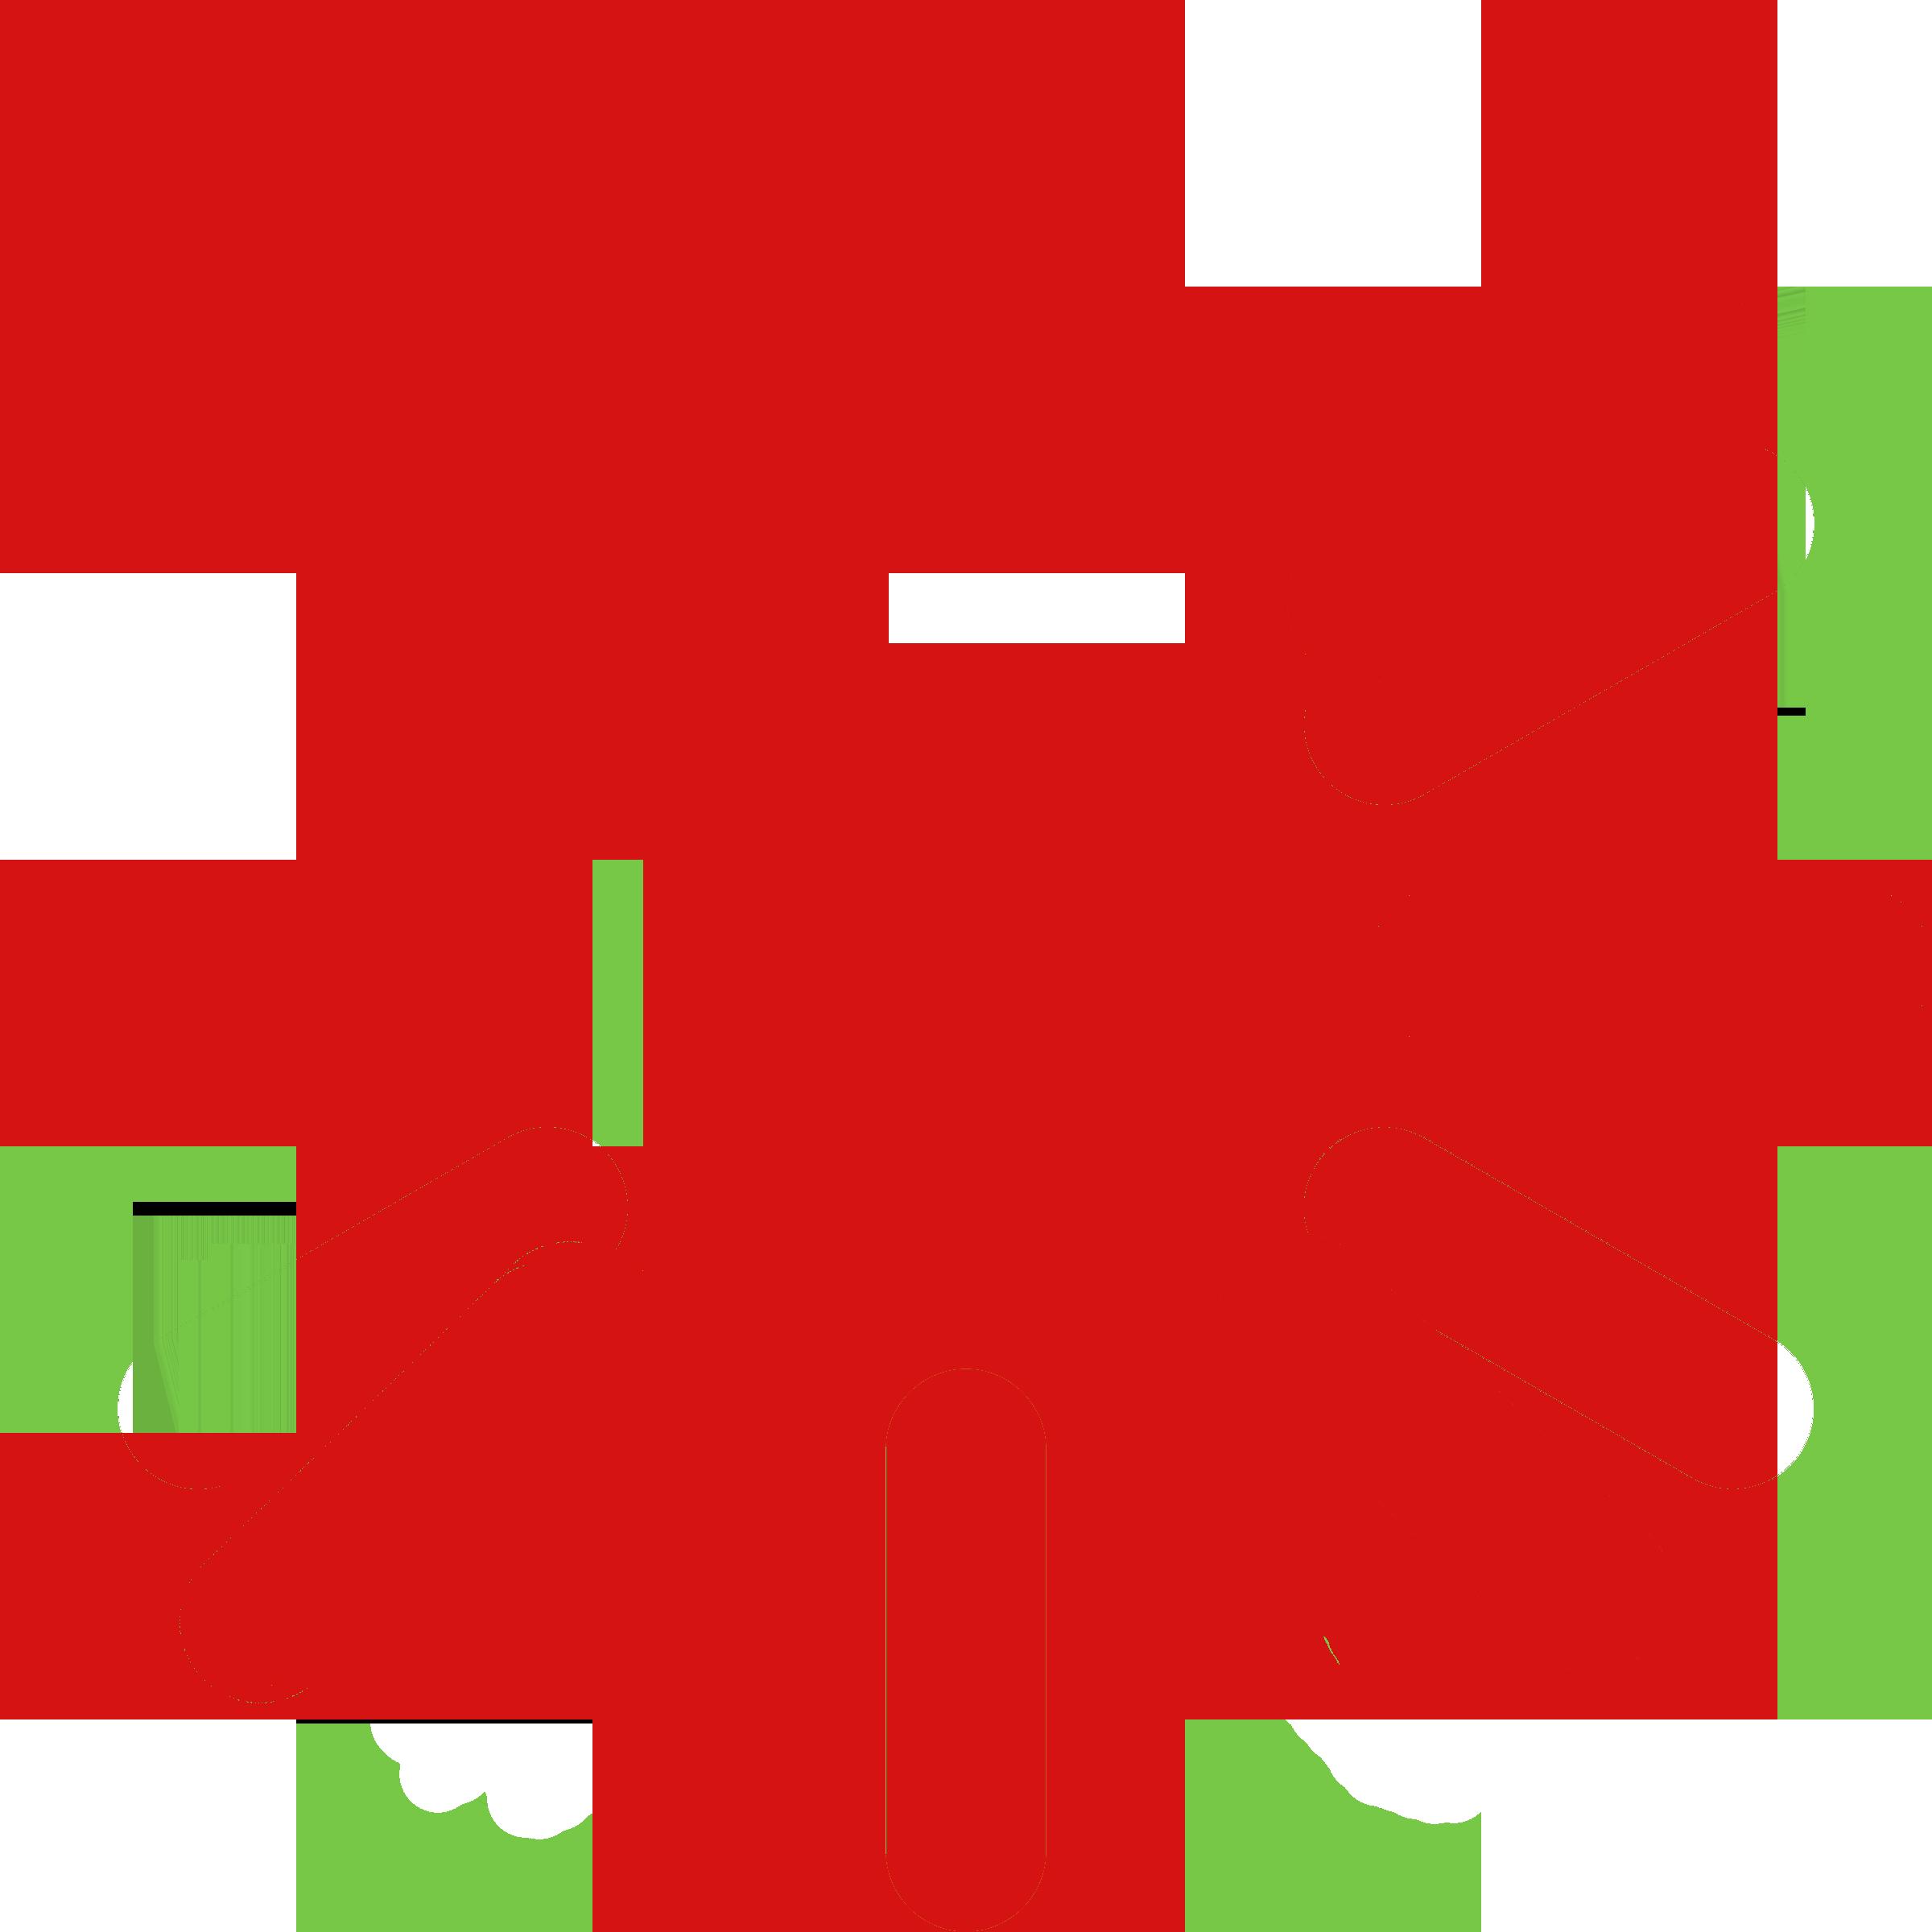 نشانگر قرمز